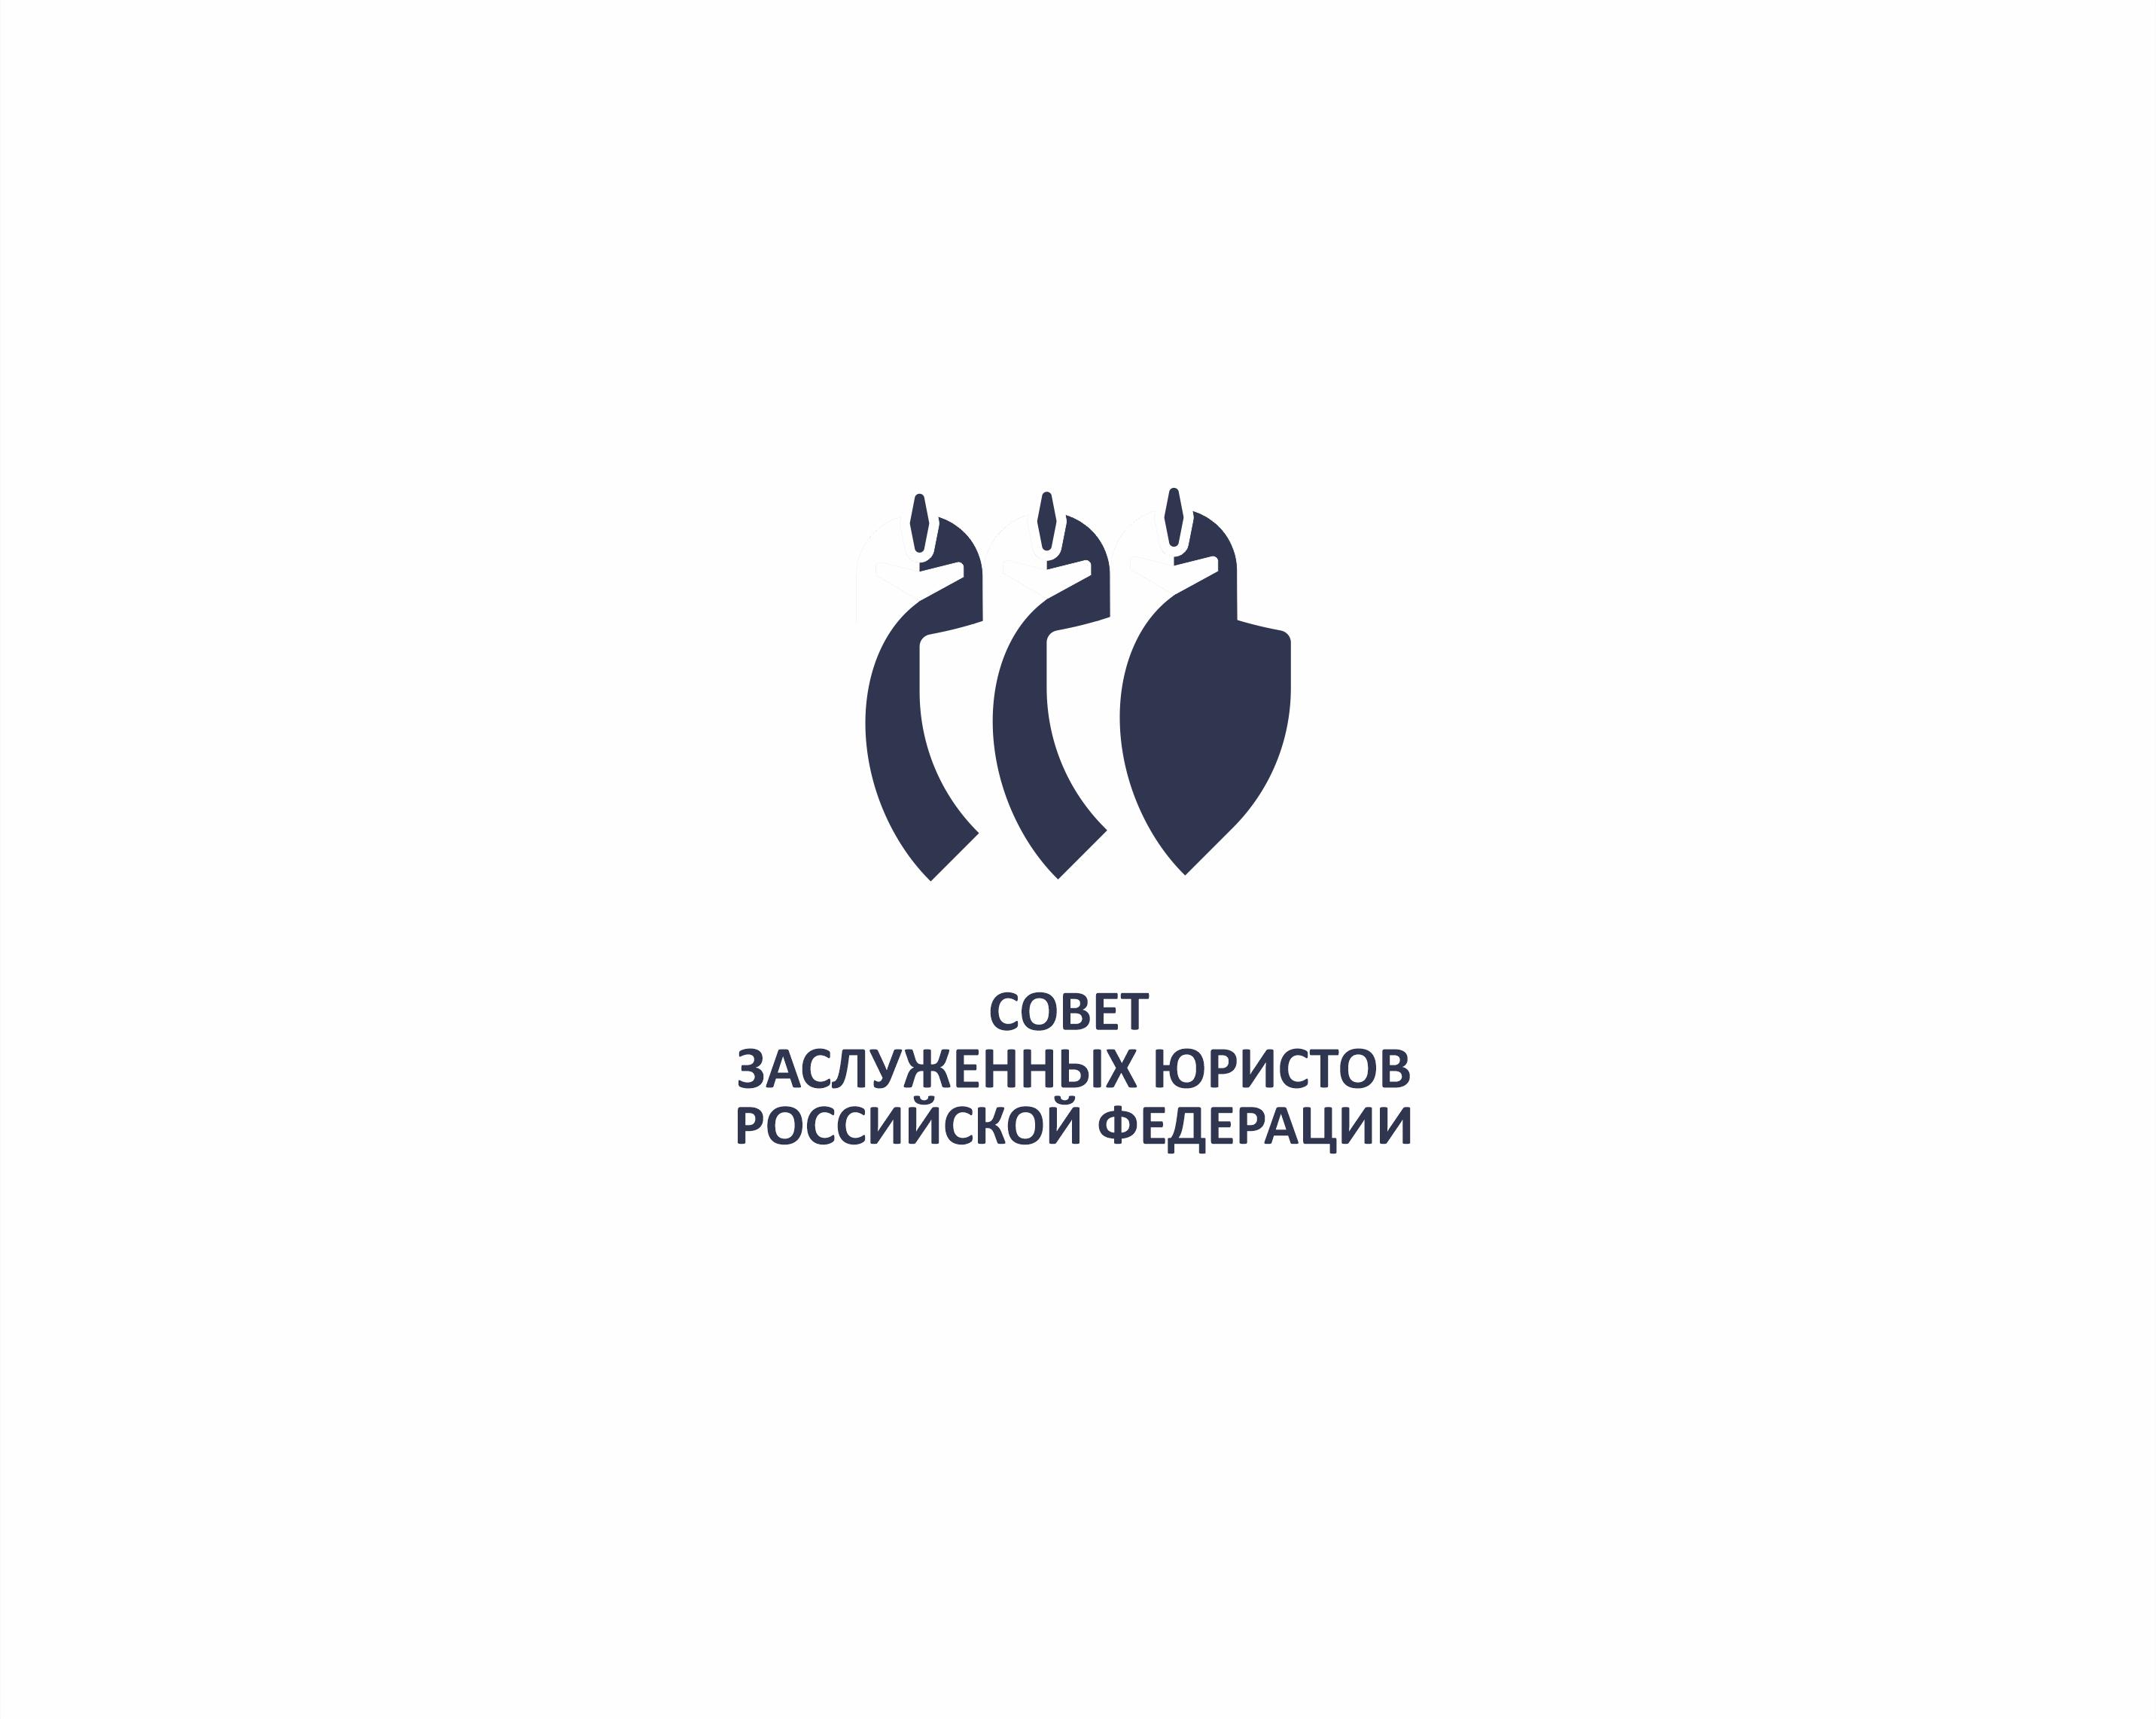 Разработка логотипа Совета (Клуба) заслуженных юристов Российской Федерации фото f_8785e4112f6eb205.png